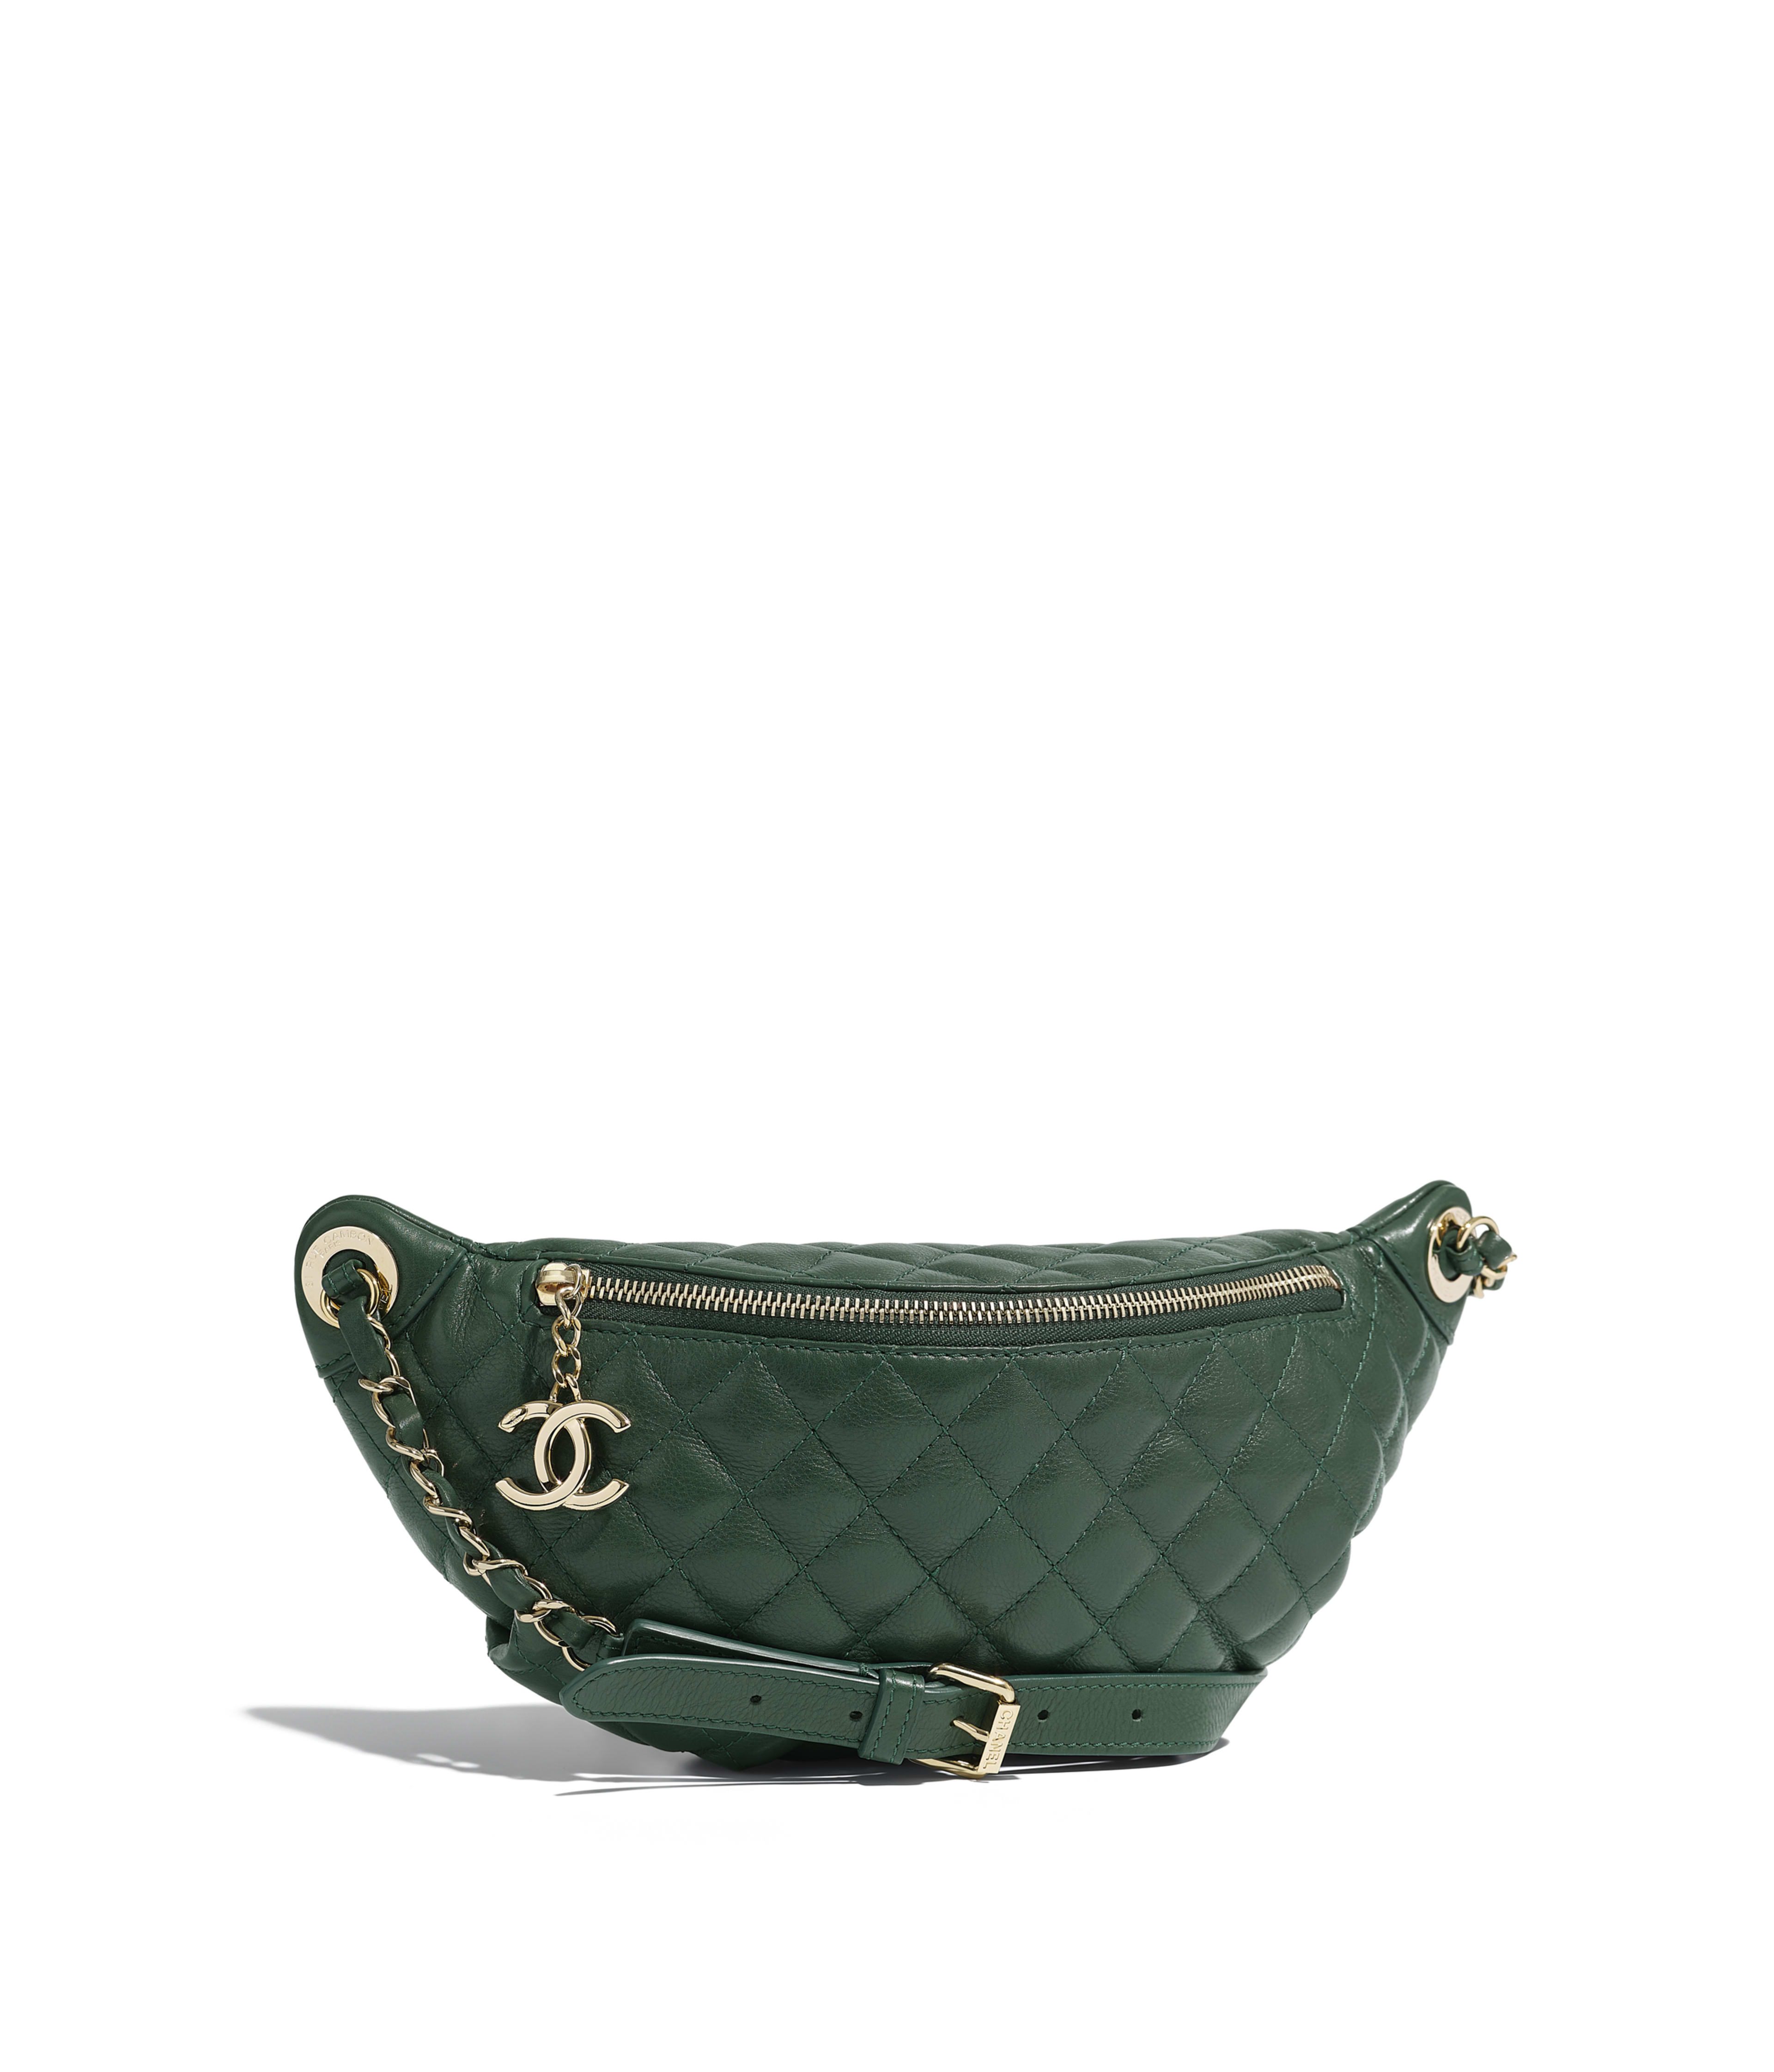 276bbf69eb07 Waist Purse Chanel - New image Of Purse